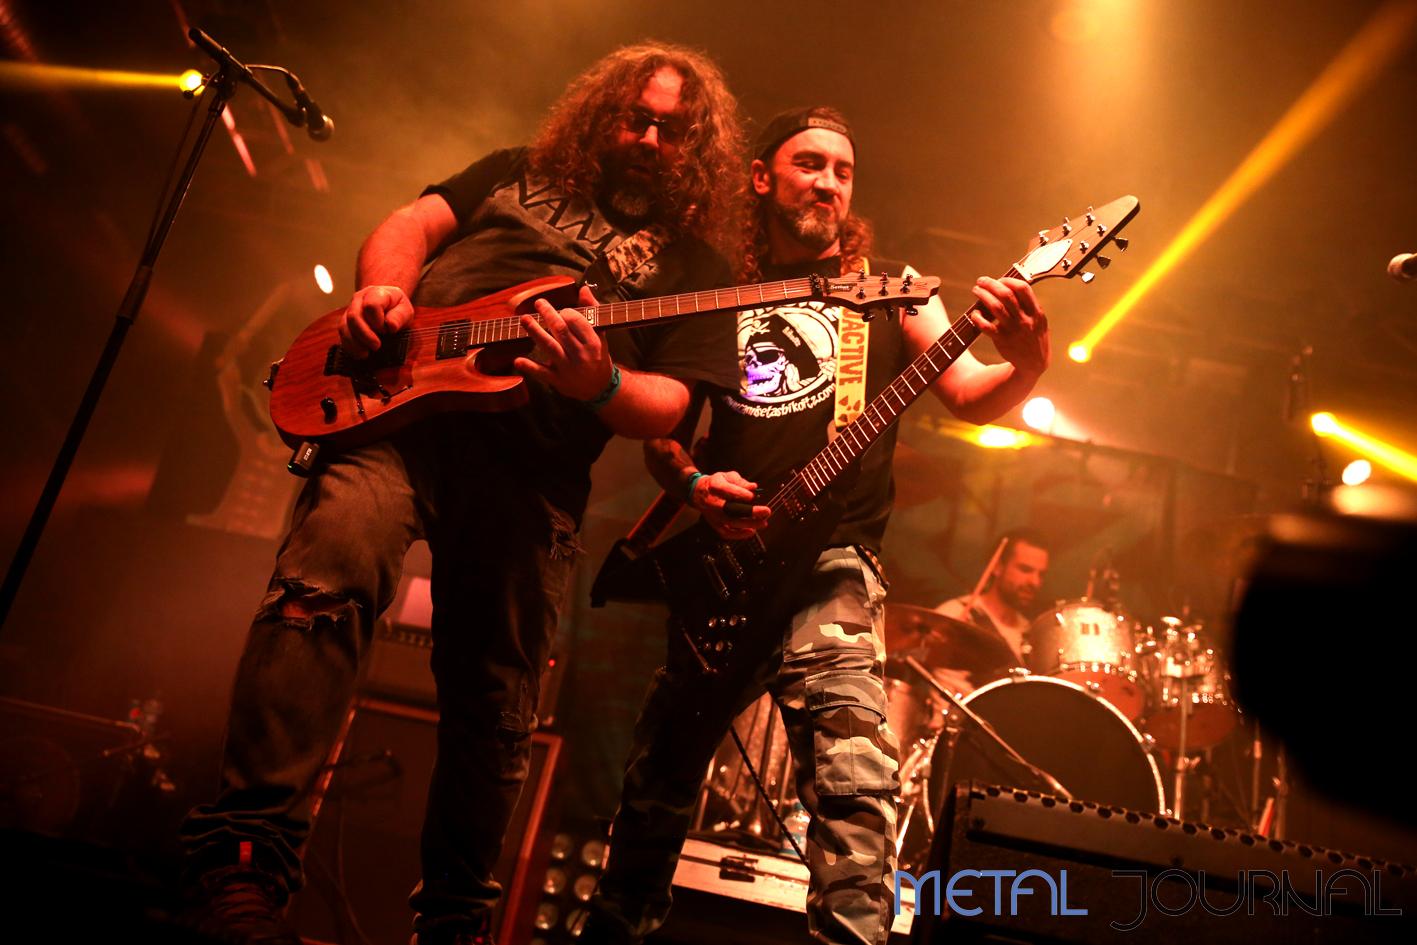 auritz 2018 bilbao metal journal pic 2